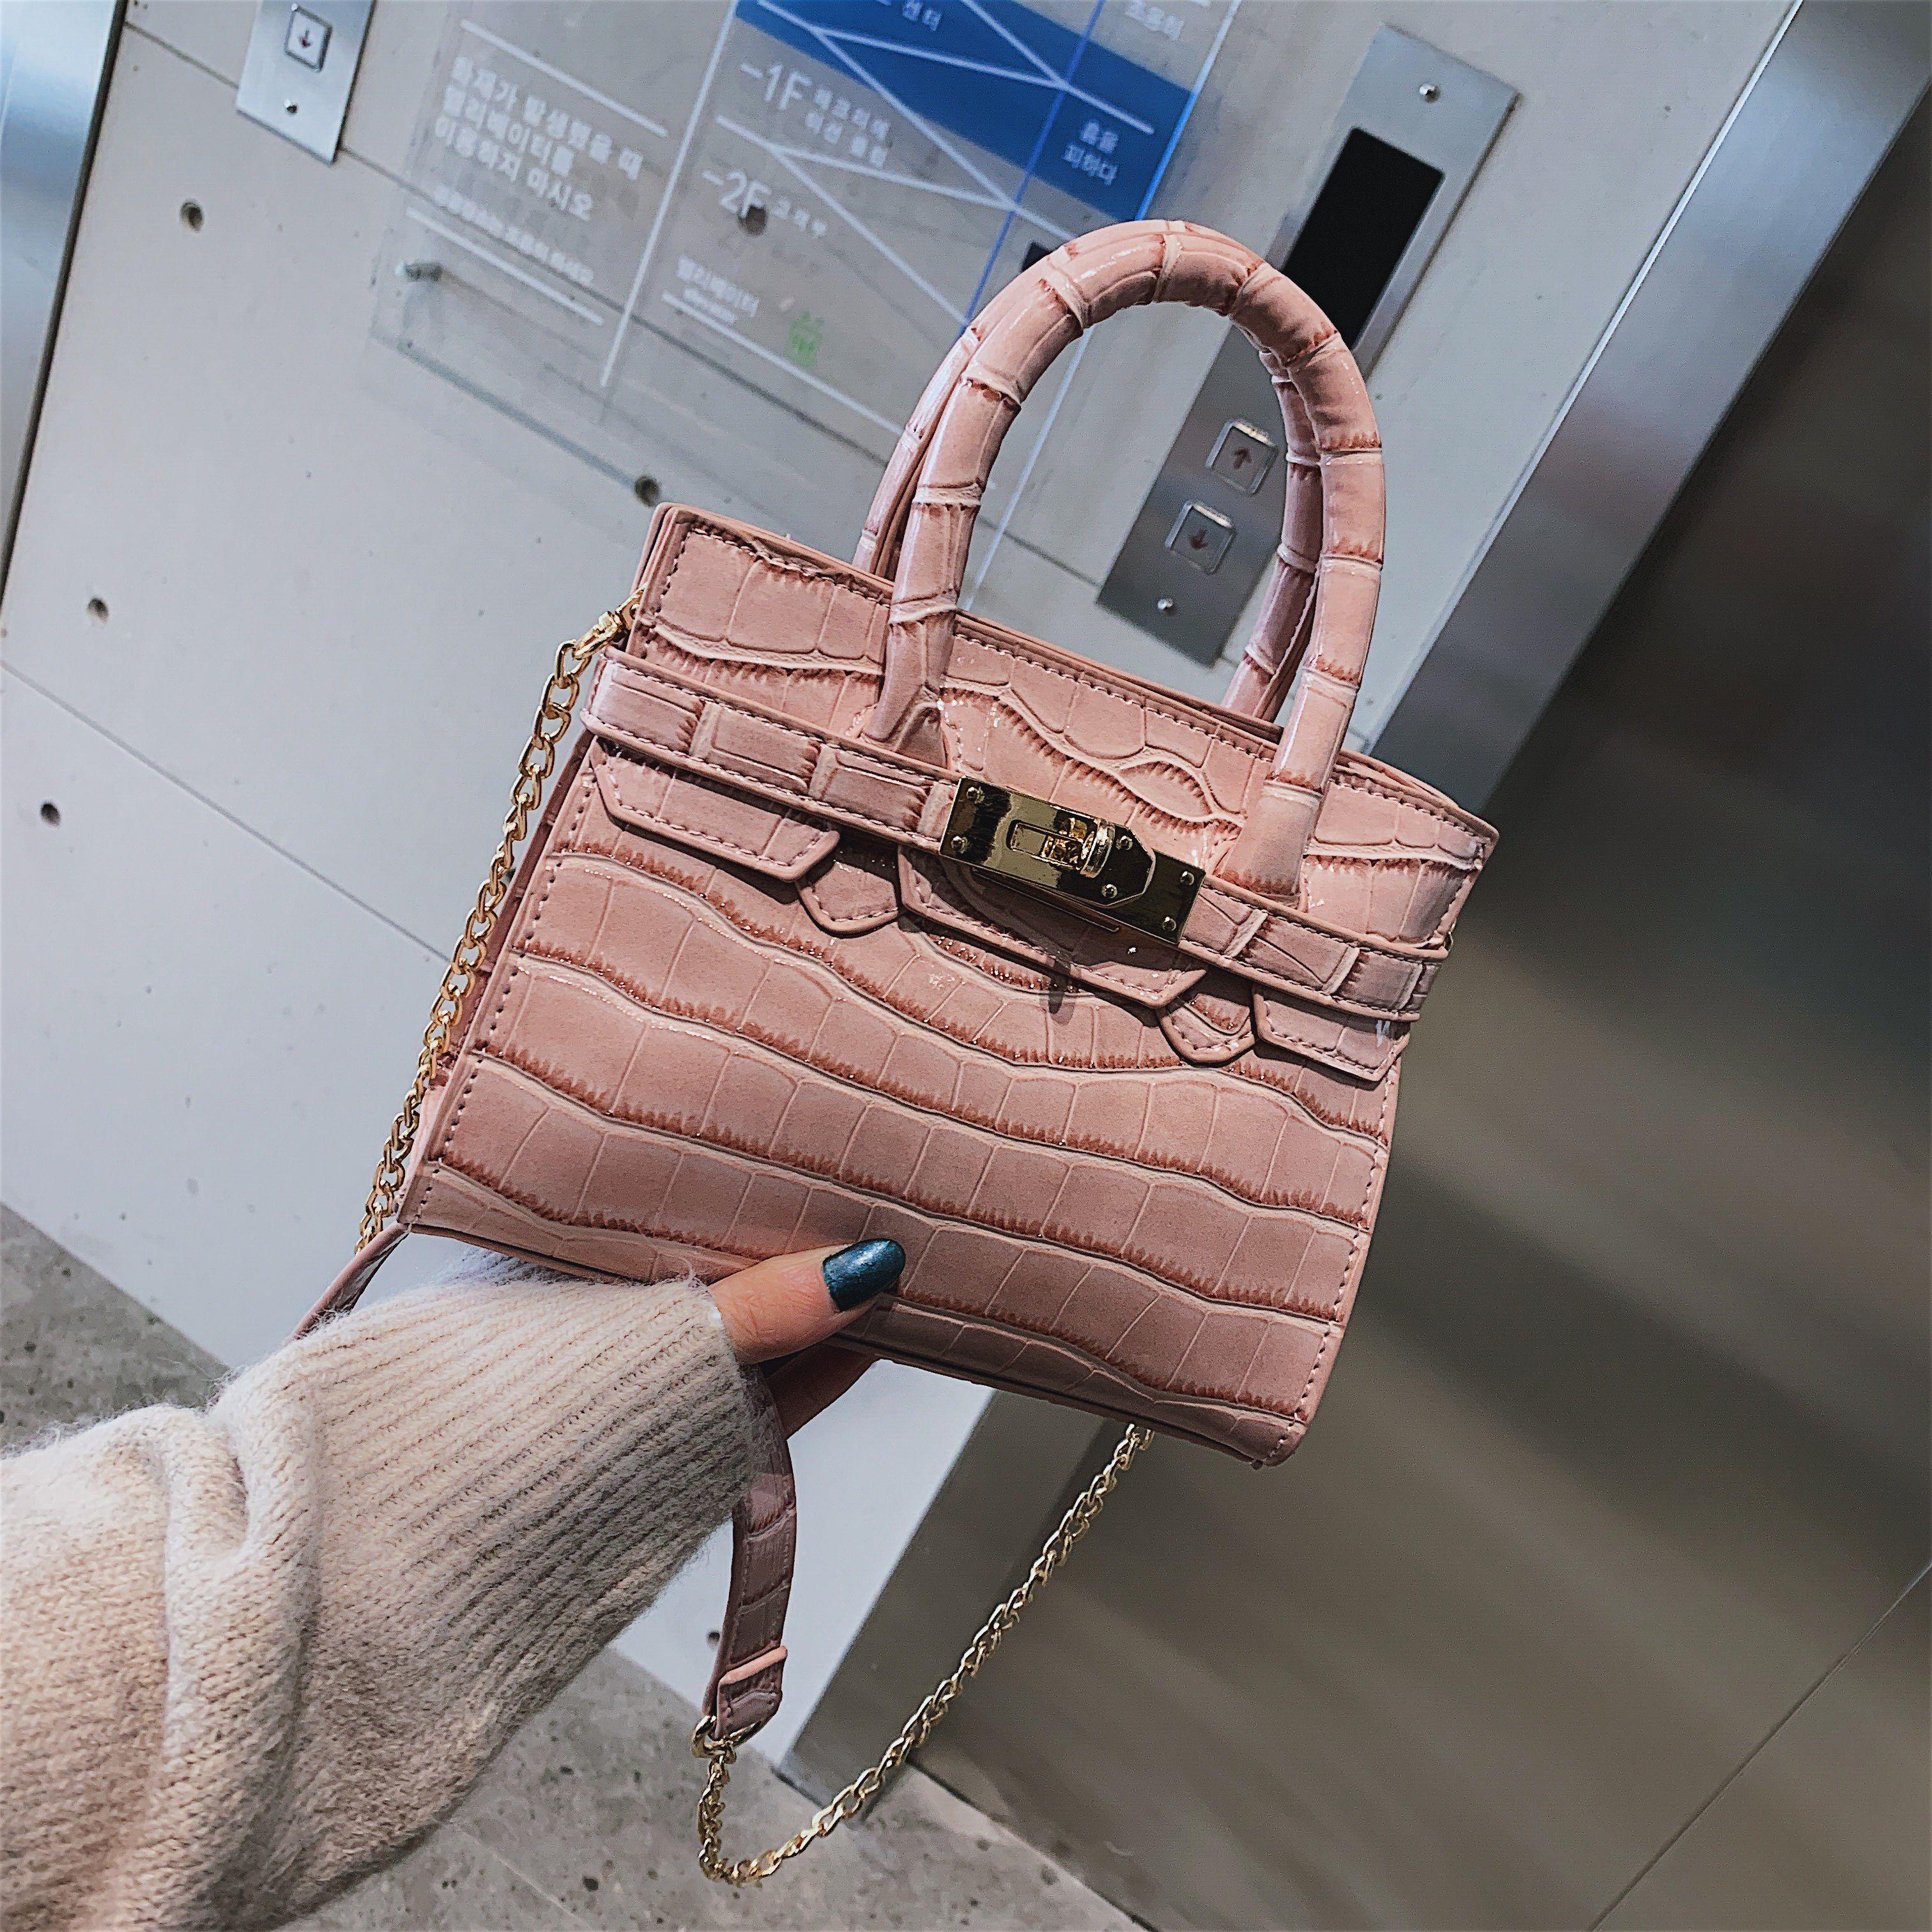 b0e4259f0e6d 2018 Messenger Bags Strap Cross Body Shoulder Tuote Bags Handbag ...